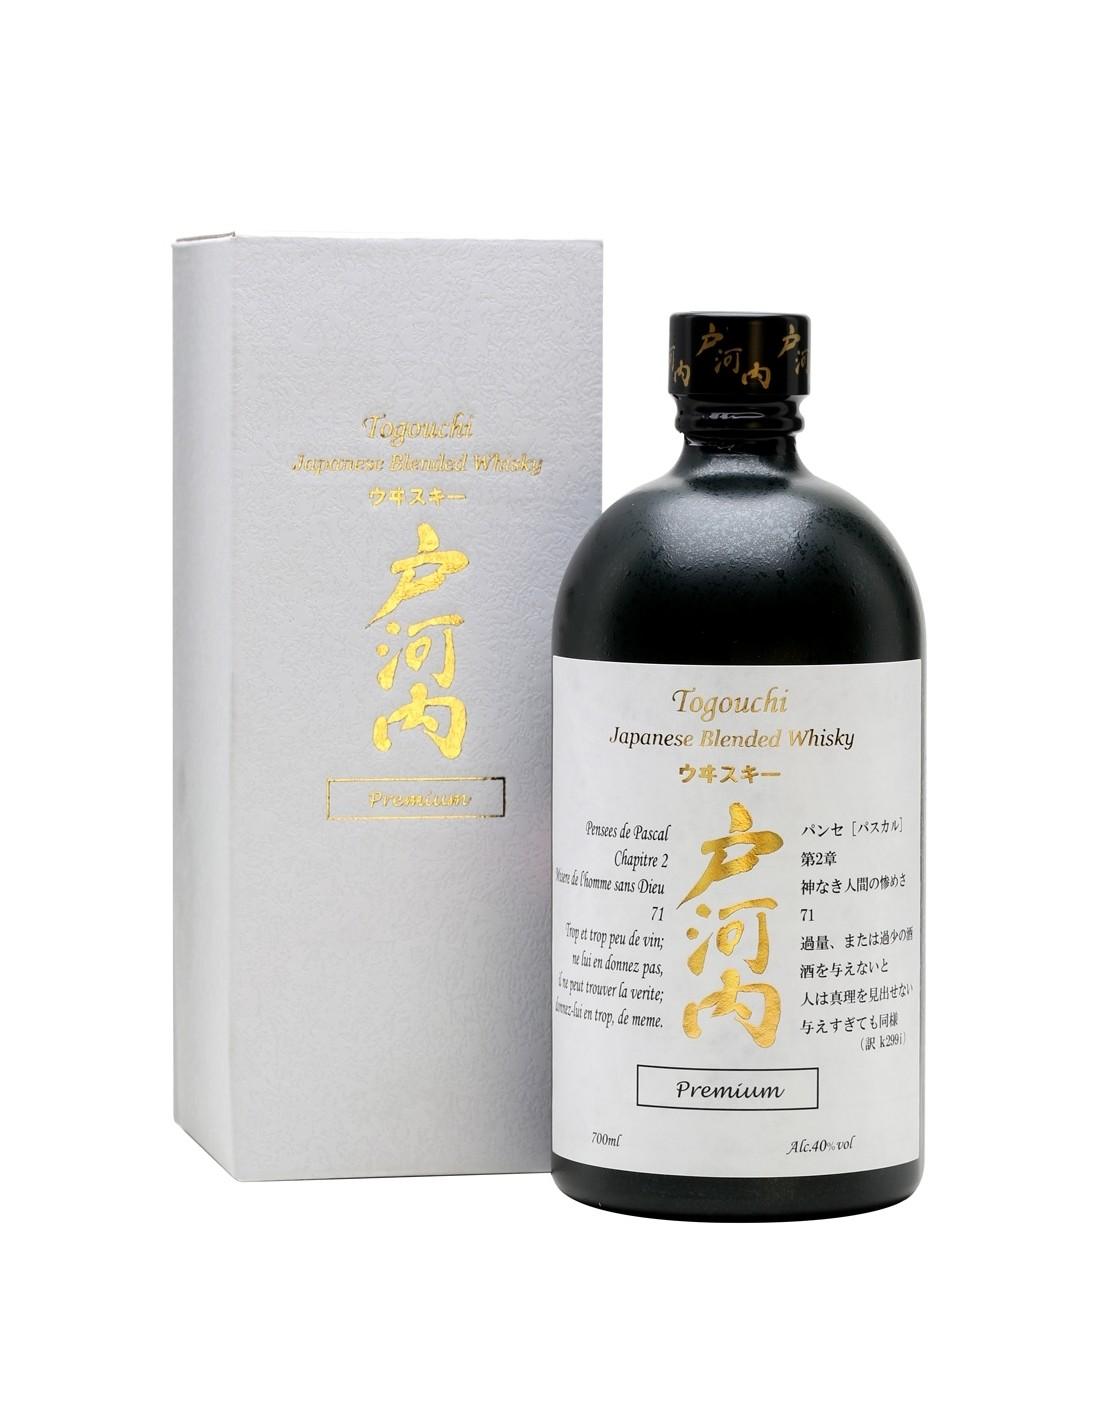 Whisky Togouchi Blended Premium, 40% alc., 0.7L, Japonia